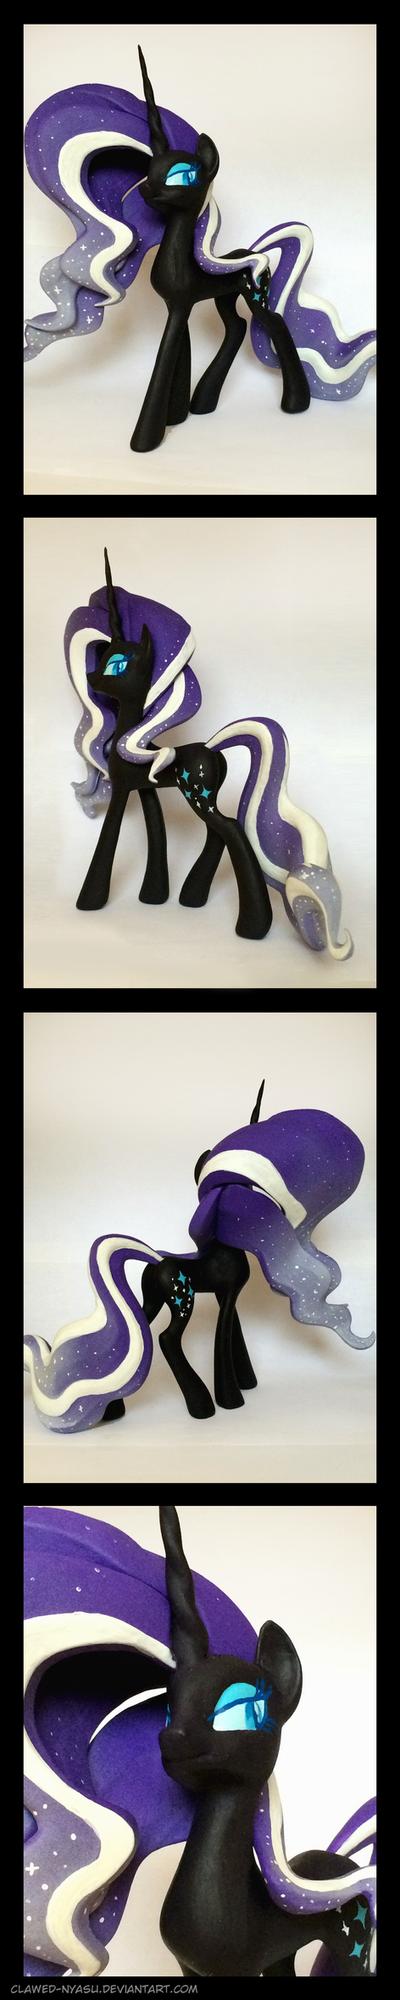 Nightmare Rarity 3D-Printed Figure by Clawed-Nyasu